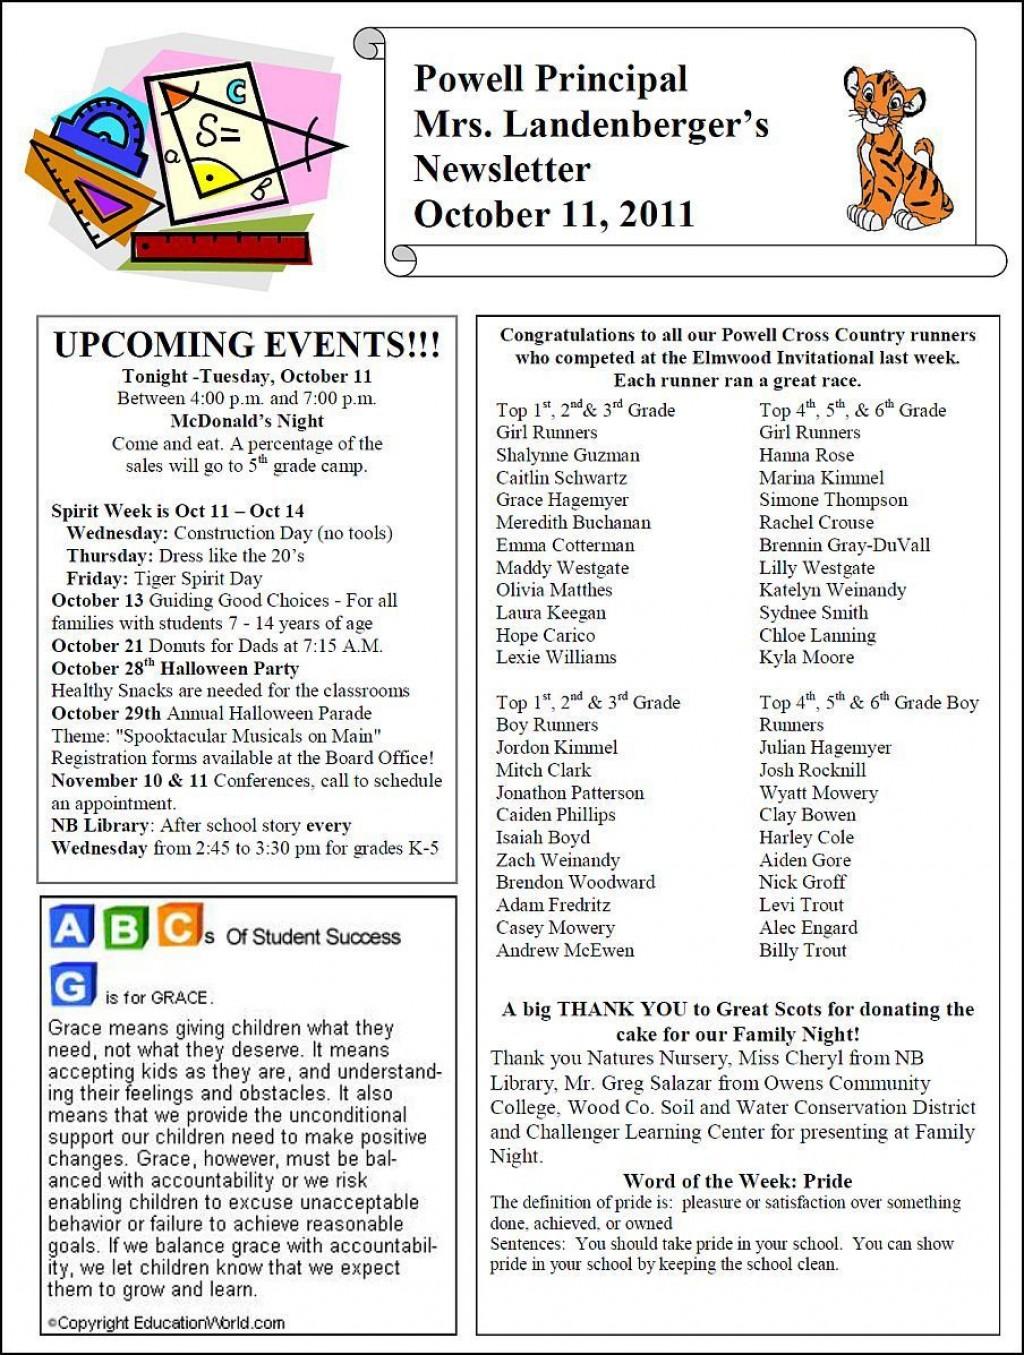 003 Breathtaking Elementary School Newsletter Template Photo  Clas Teacher Free CounselorLarge